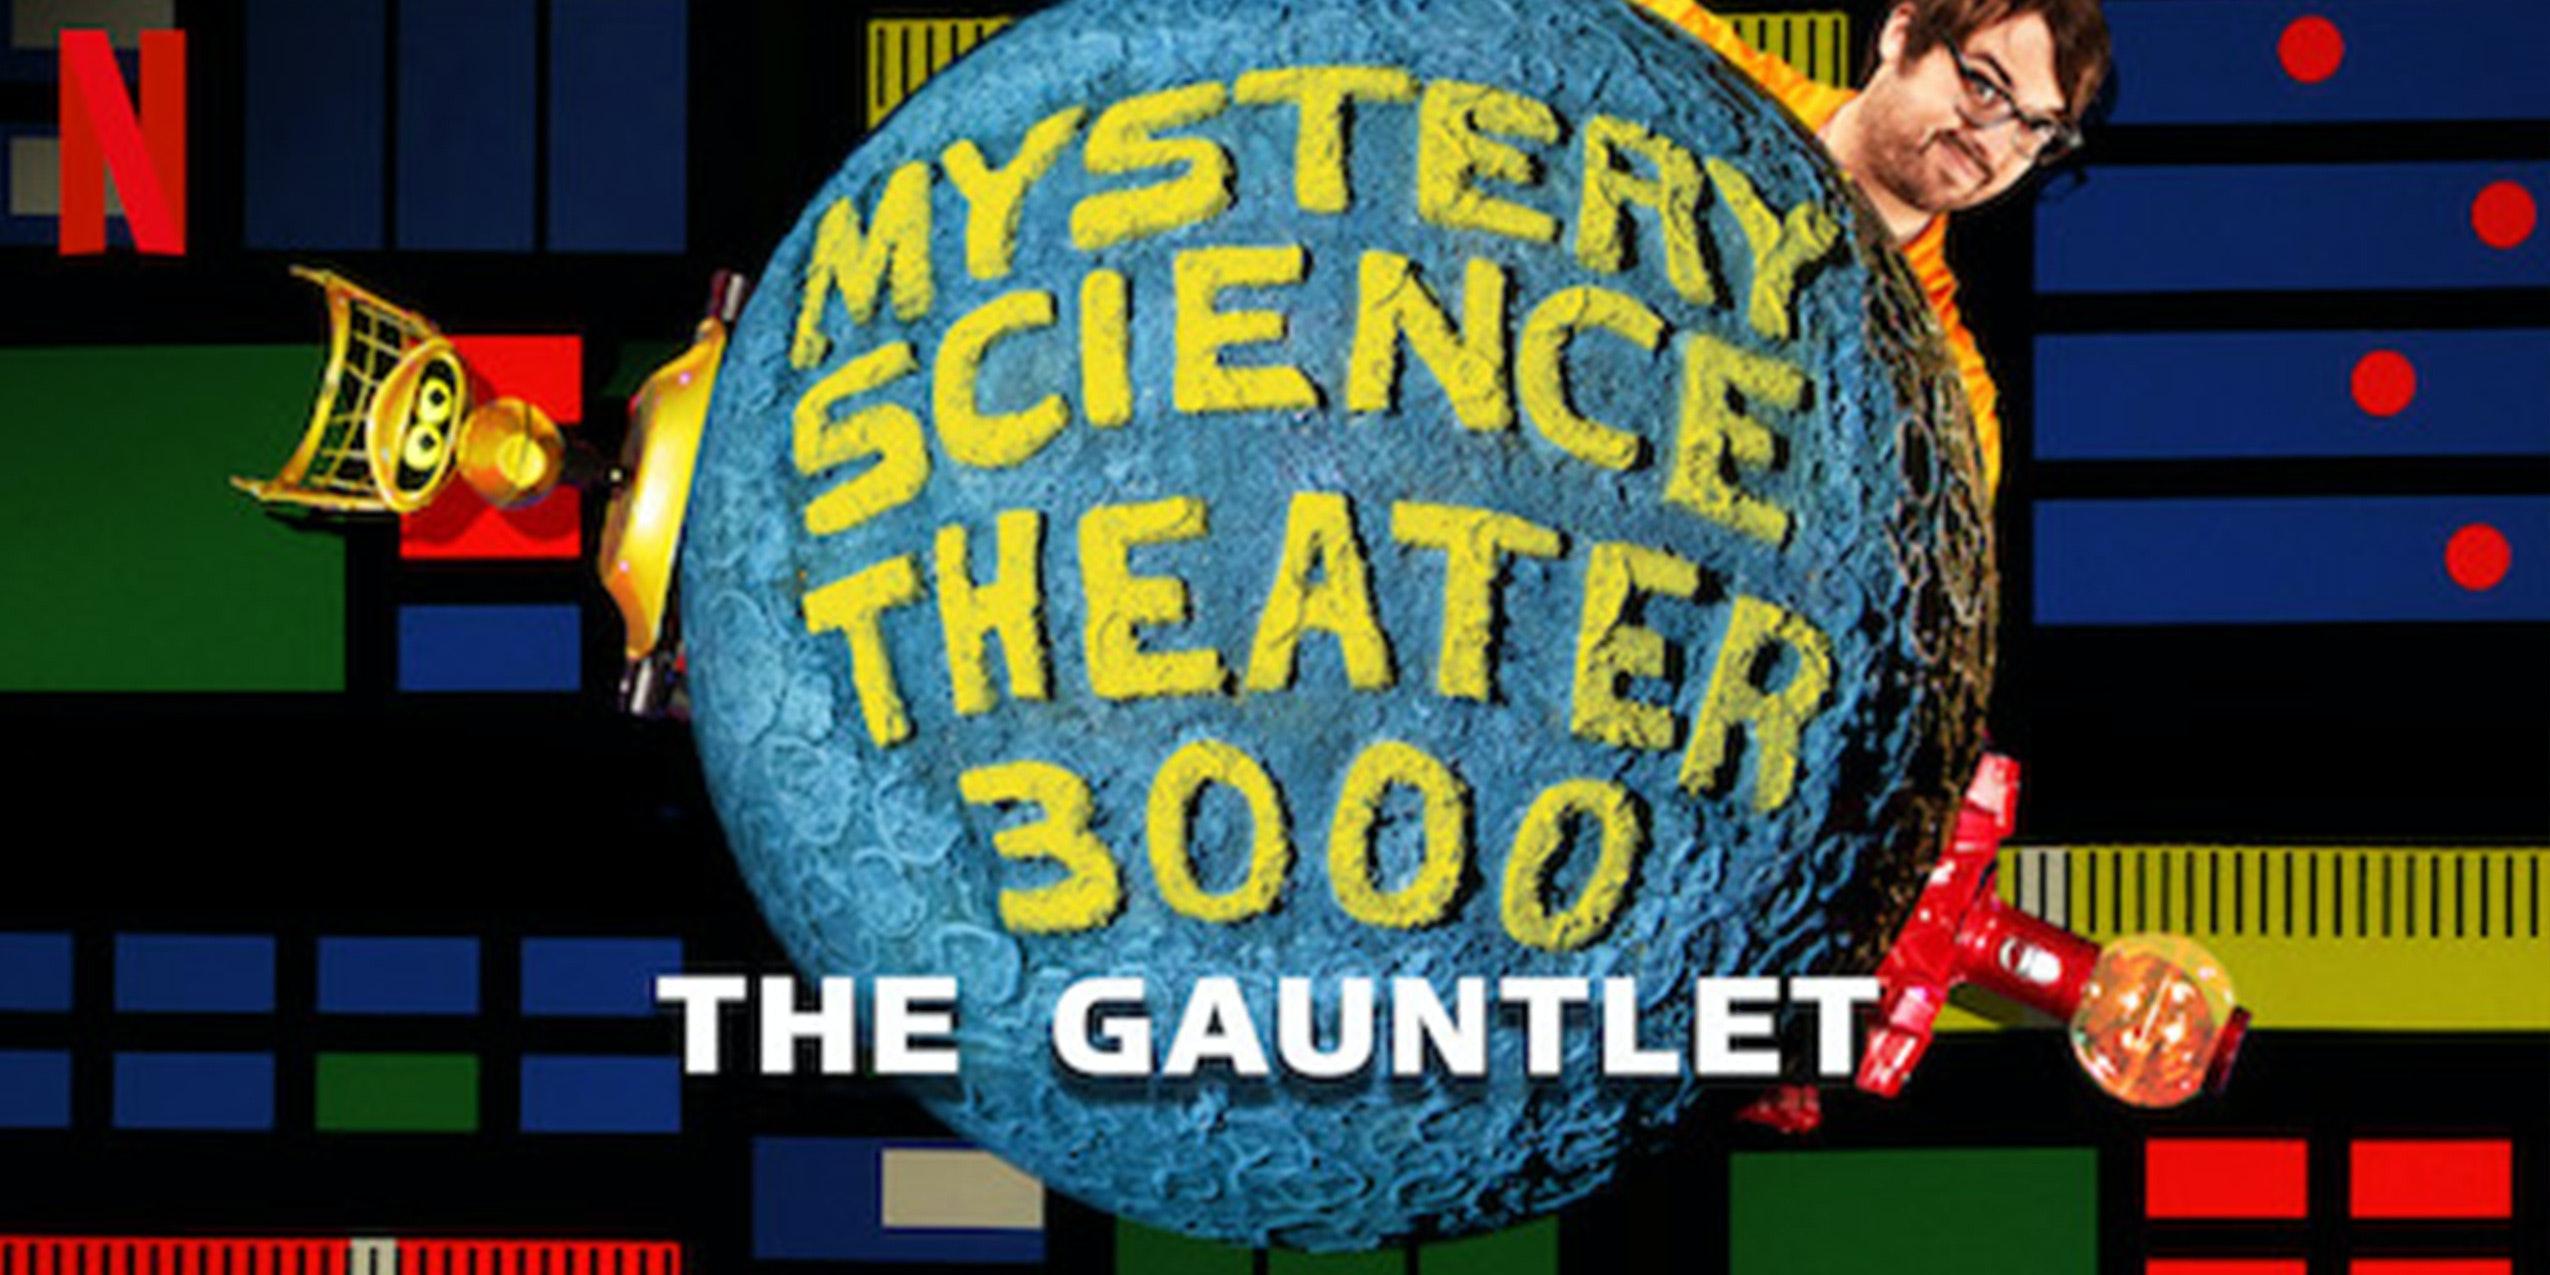 master science theater 3000 Netflix original series